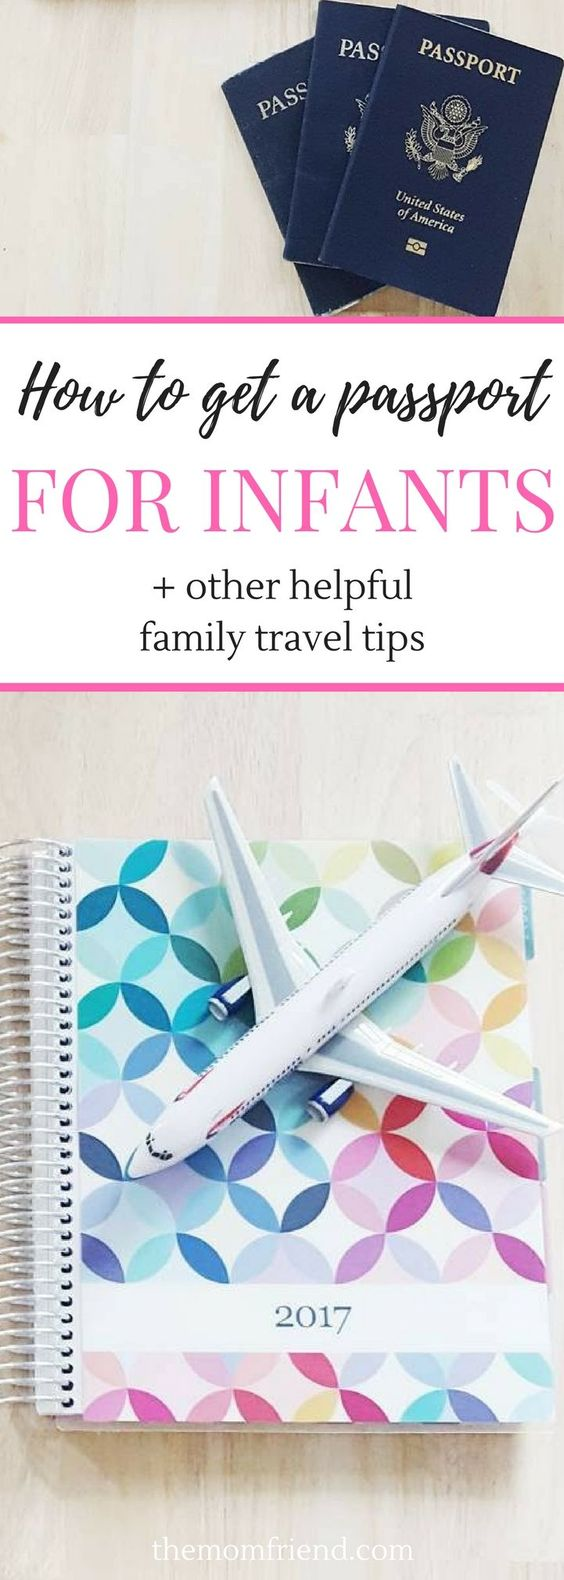 book to help me write my life story